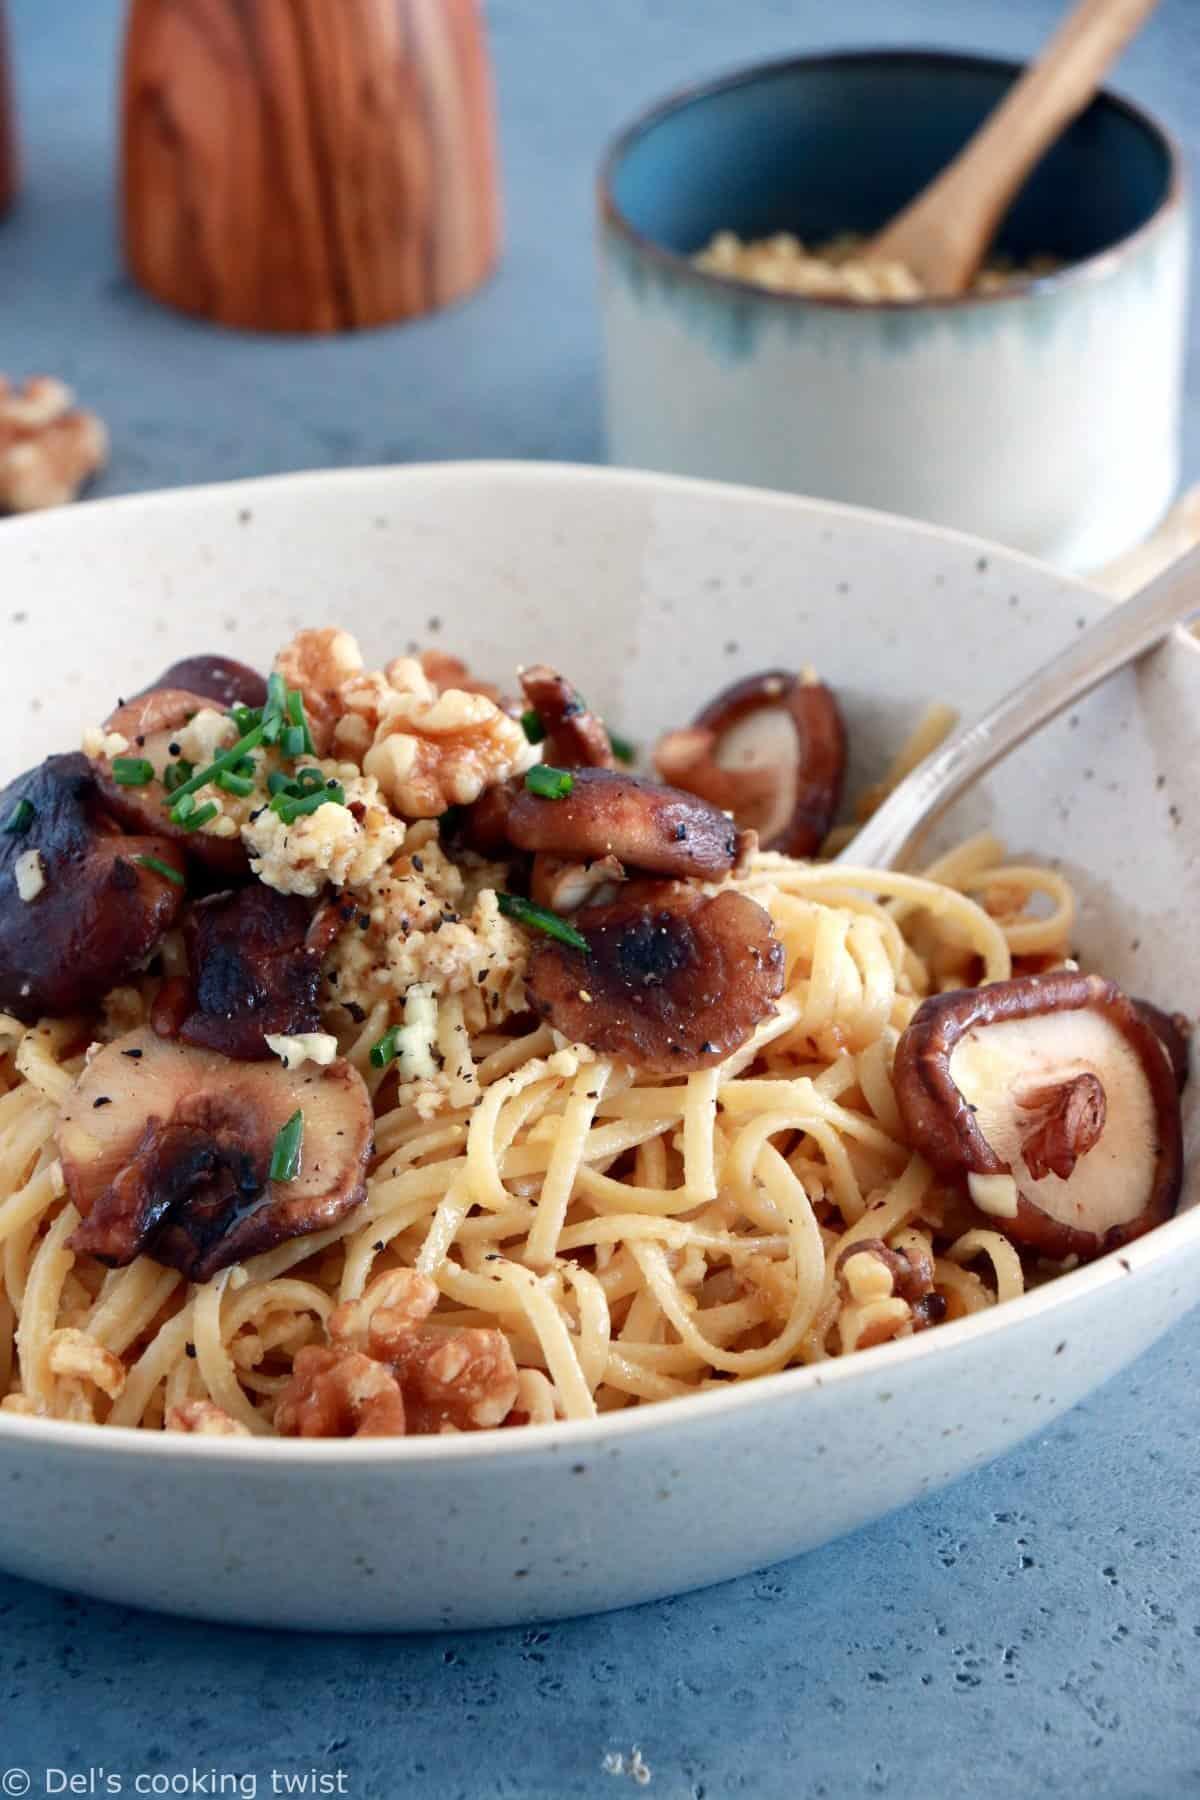 Garlic Mushrooms with Walnut Pesto Pasta